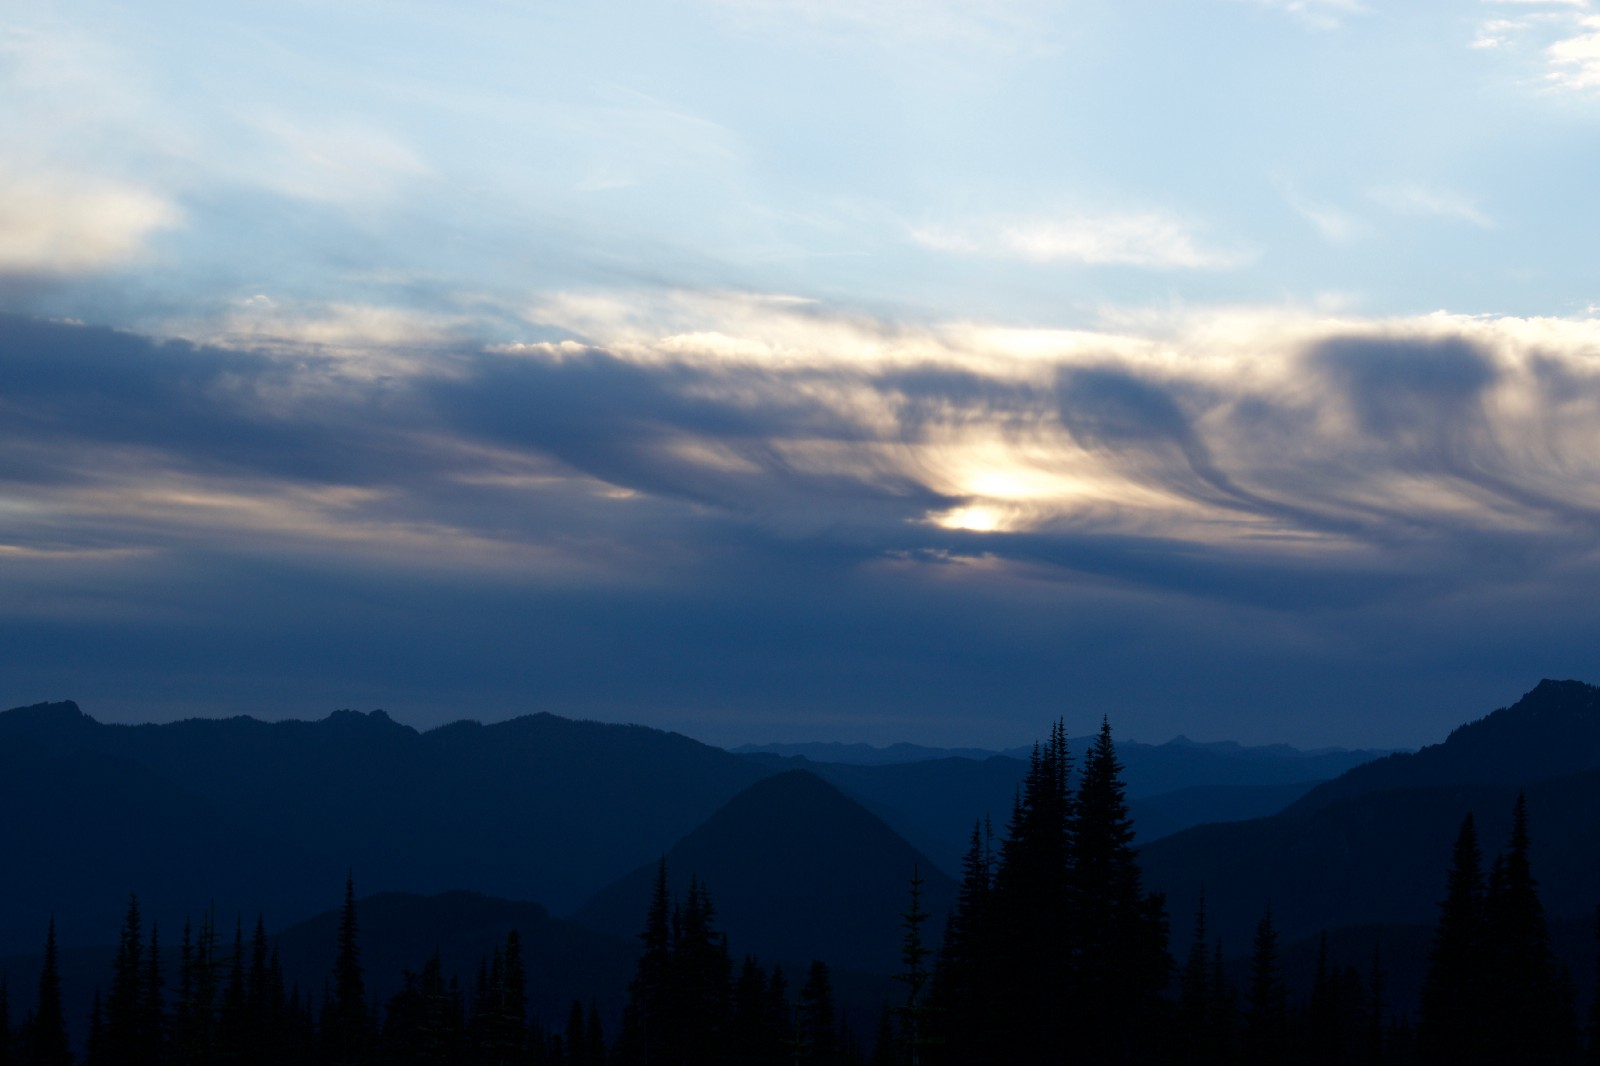 Mountains as far as the eye can see. Mt. Rainier National Park, Washington.